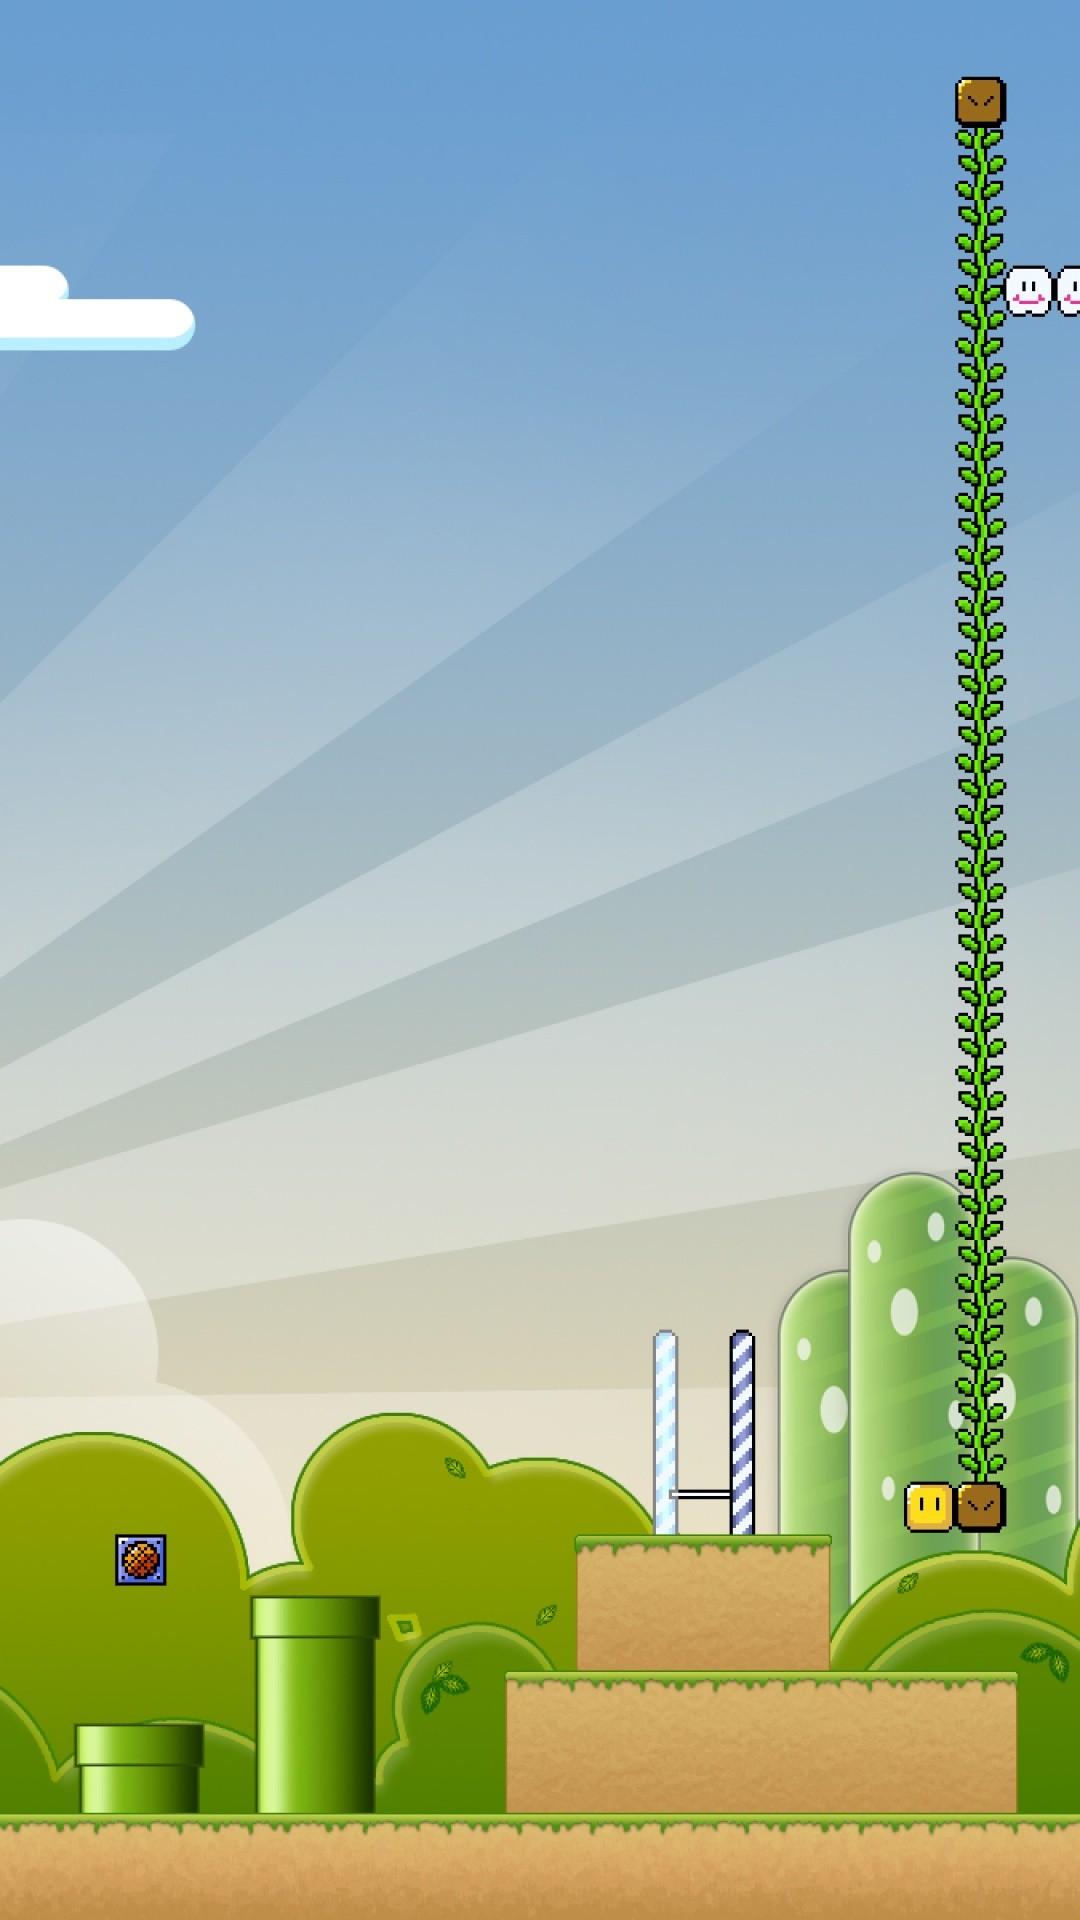 mario-iphone-wallpaper-mushrooms-red-green-1-up